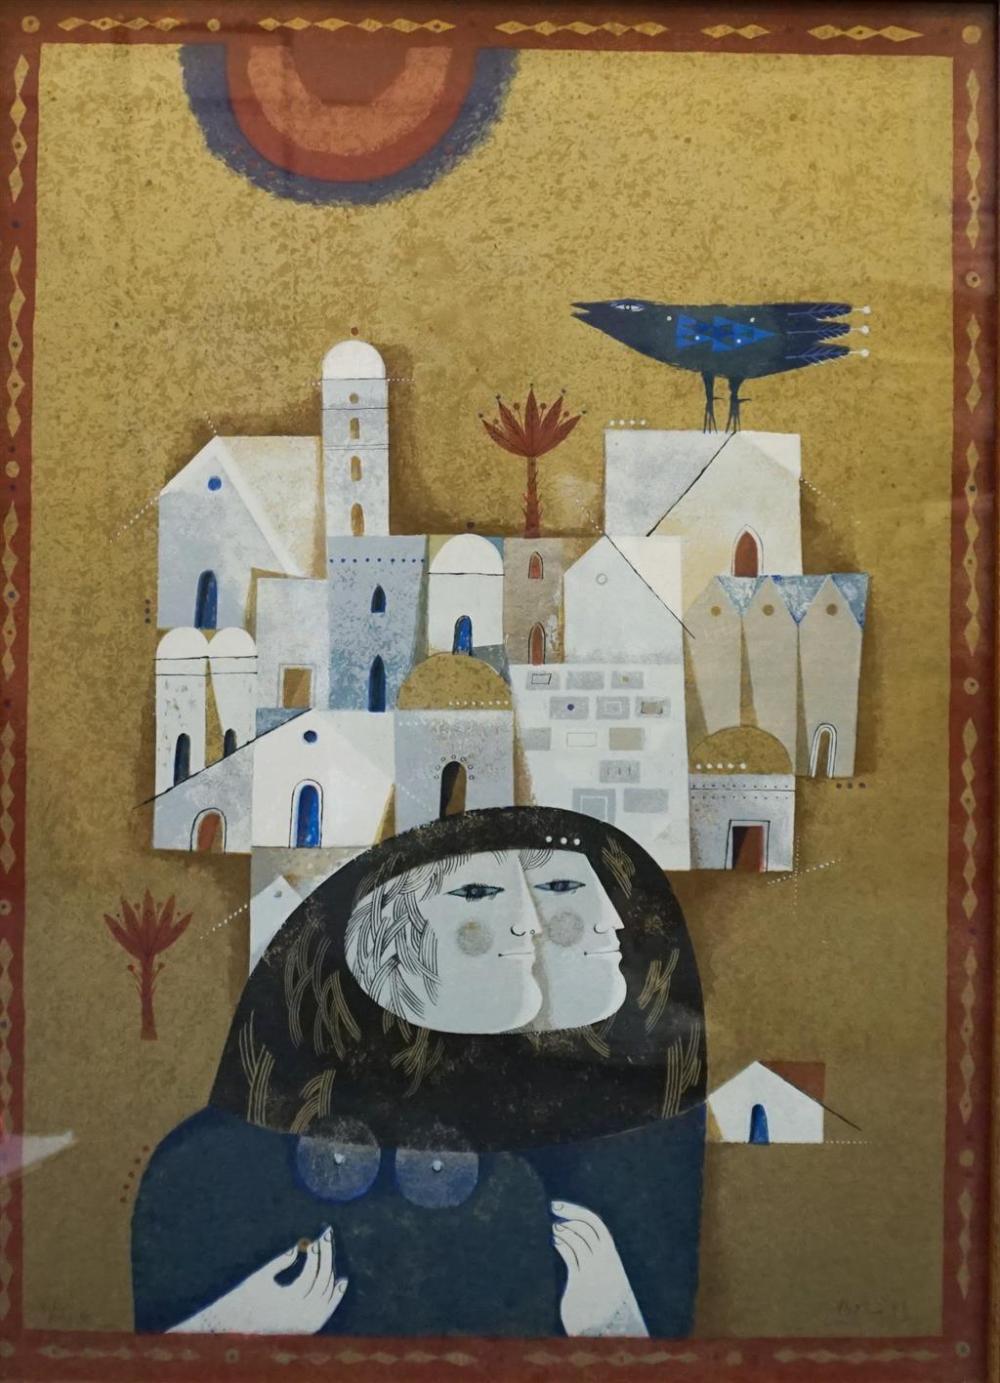 Sami Briss (Romanian/Israeli b. 1930), Couple in Jerusalem, 1979, ed. 8/200, Serigraph, Framed: 29 x 21-5/8 in